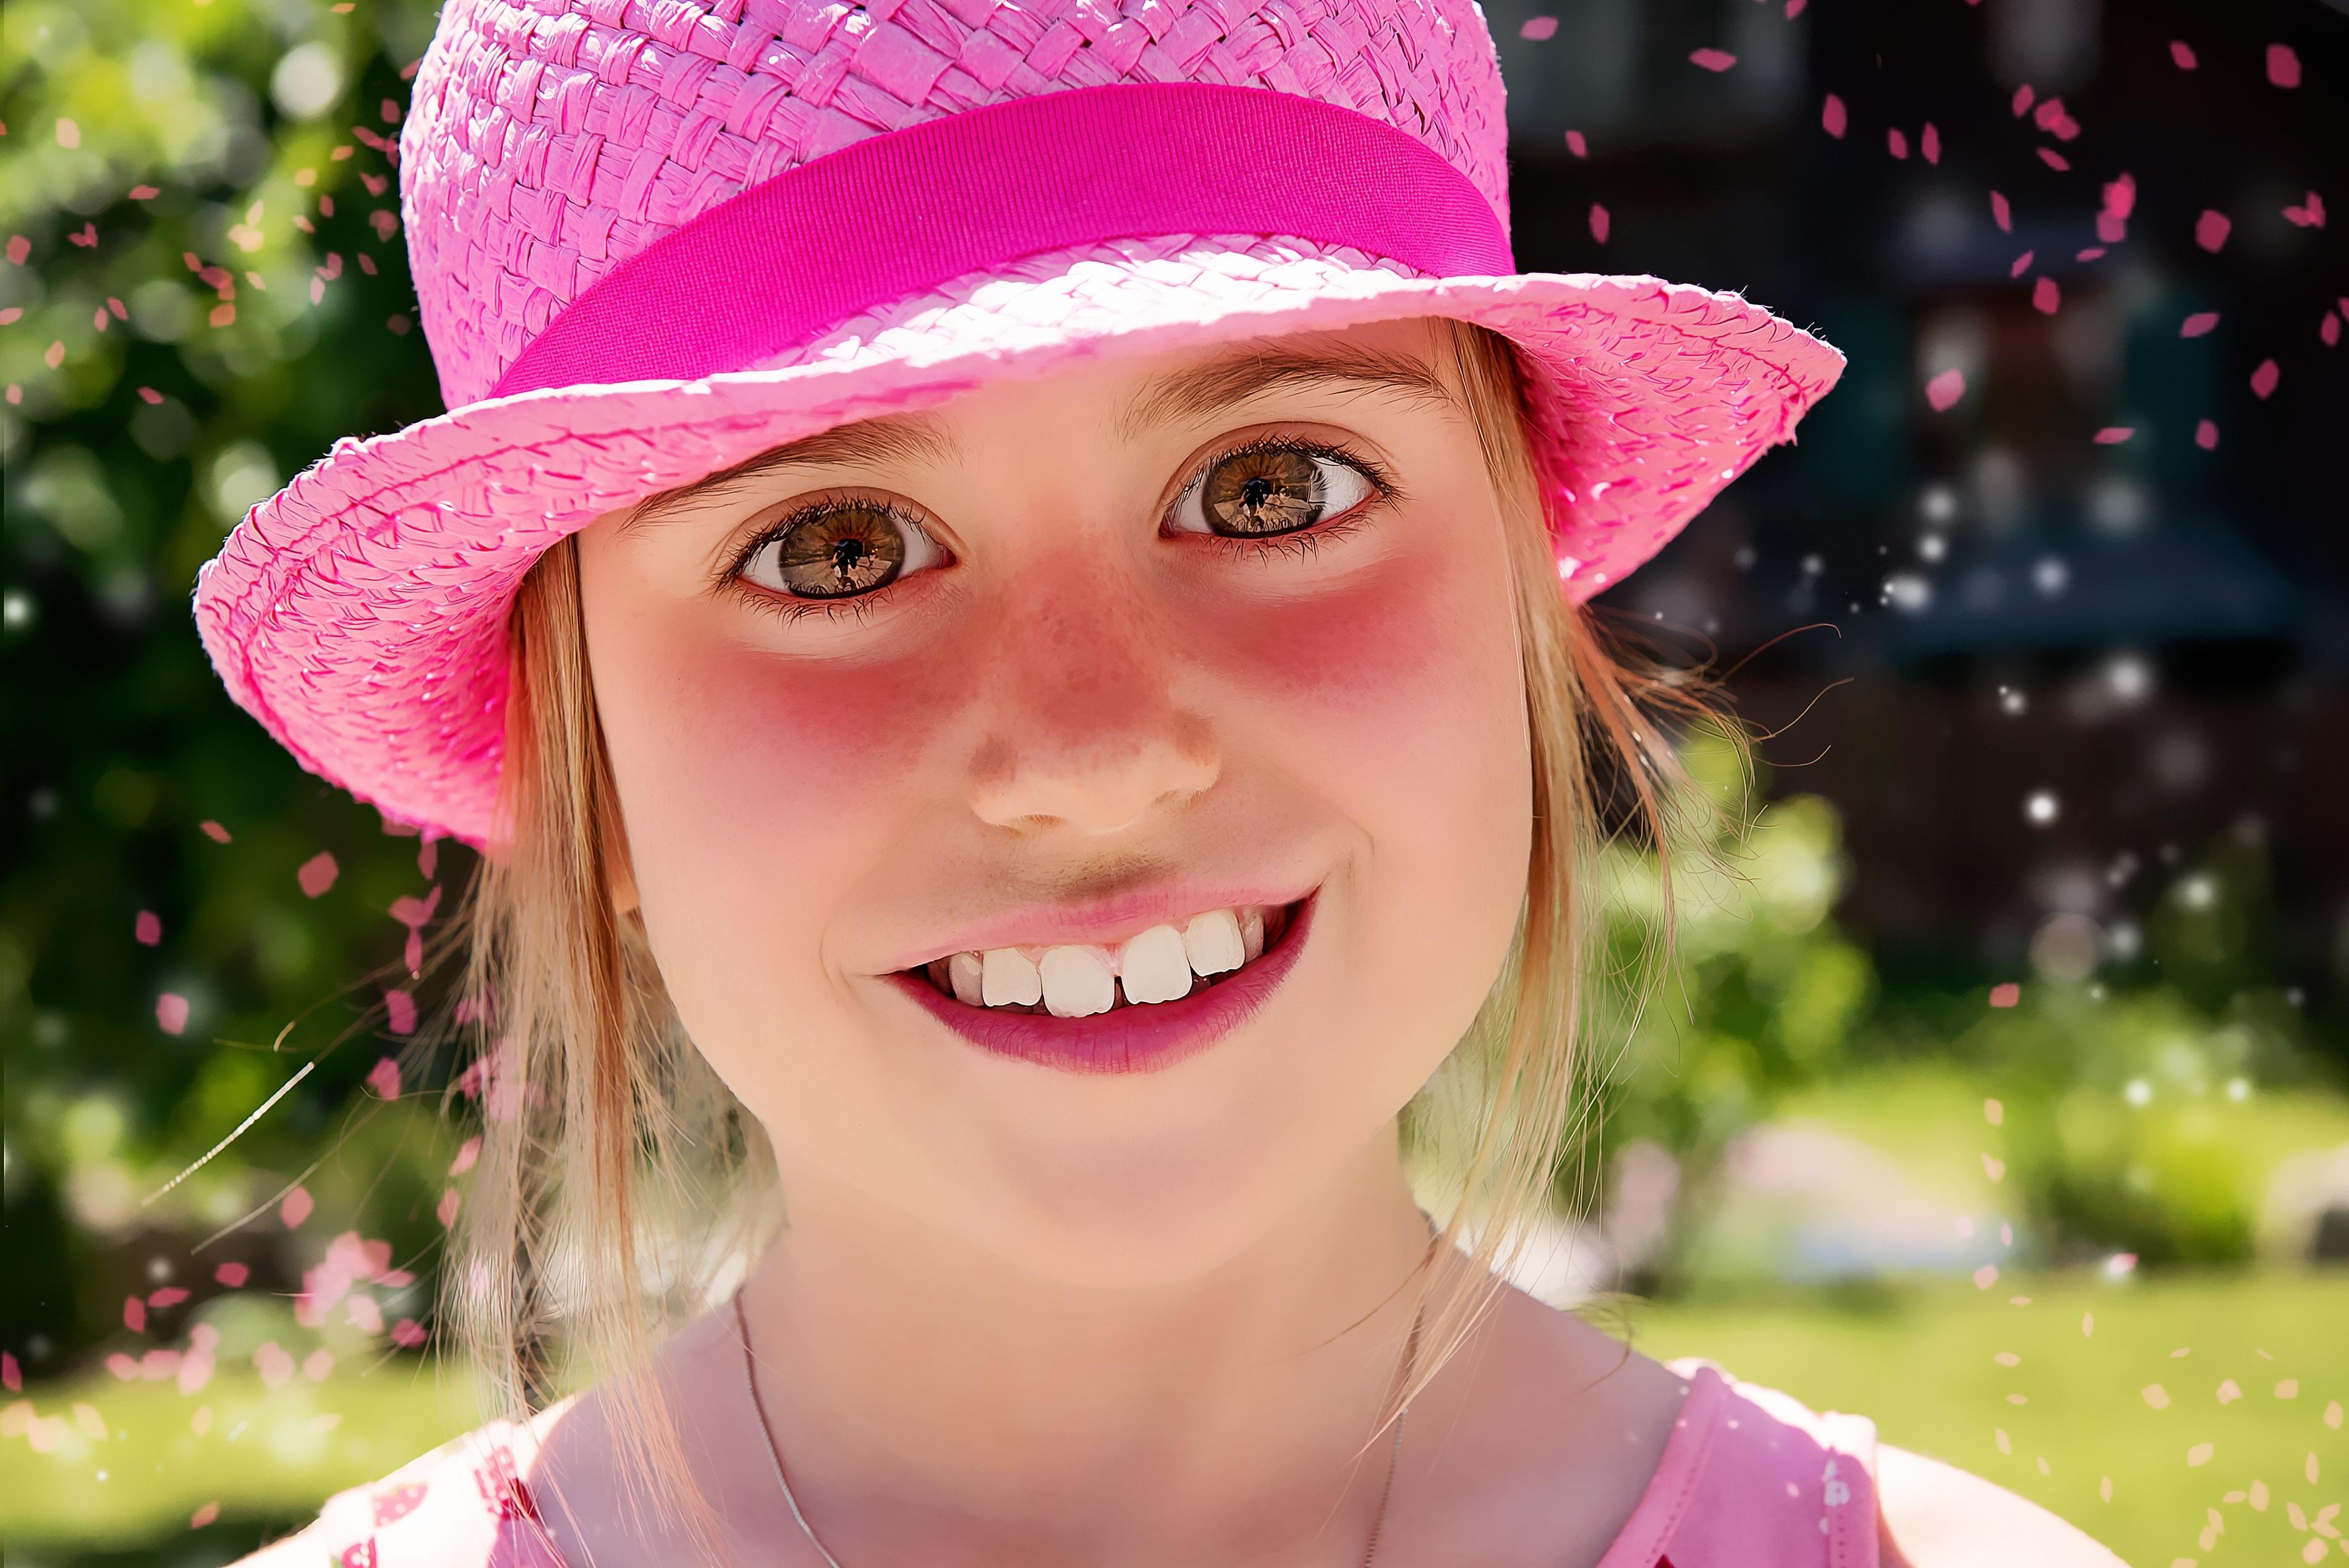 Gambar Gadis Bunga Potret Musim Semi Warna Anak Manusia